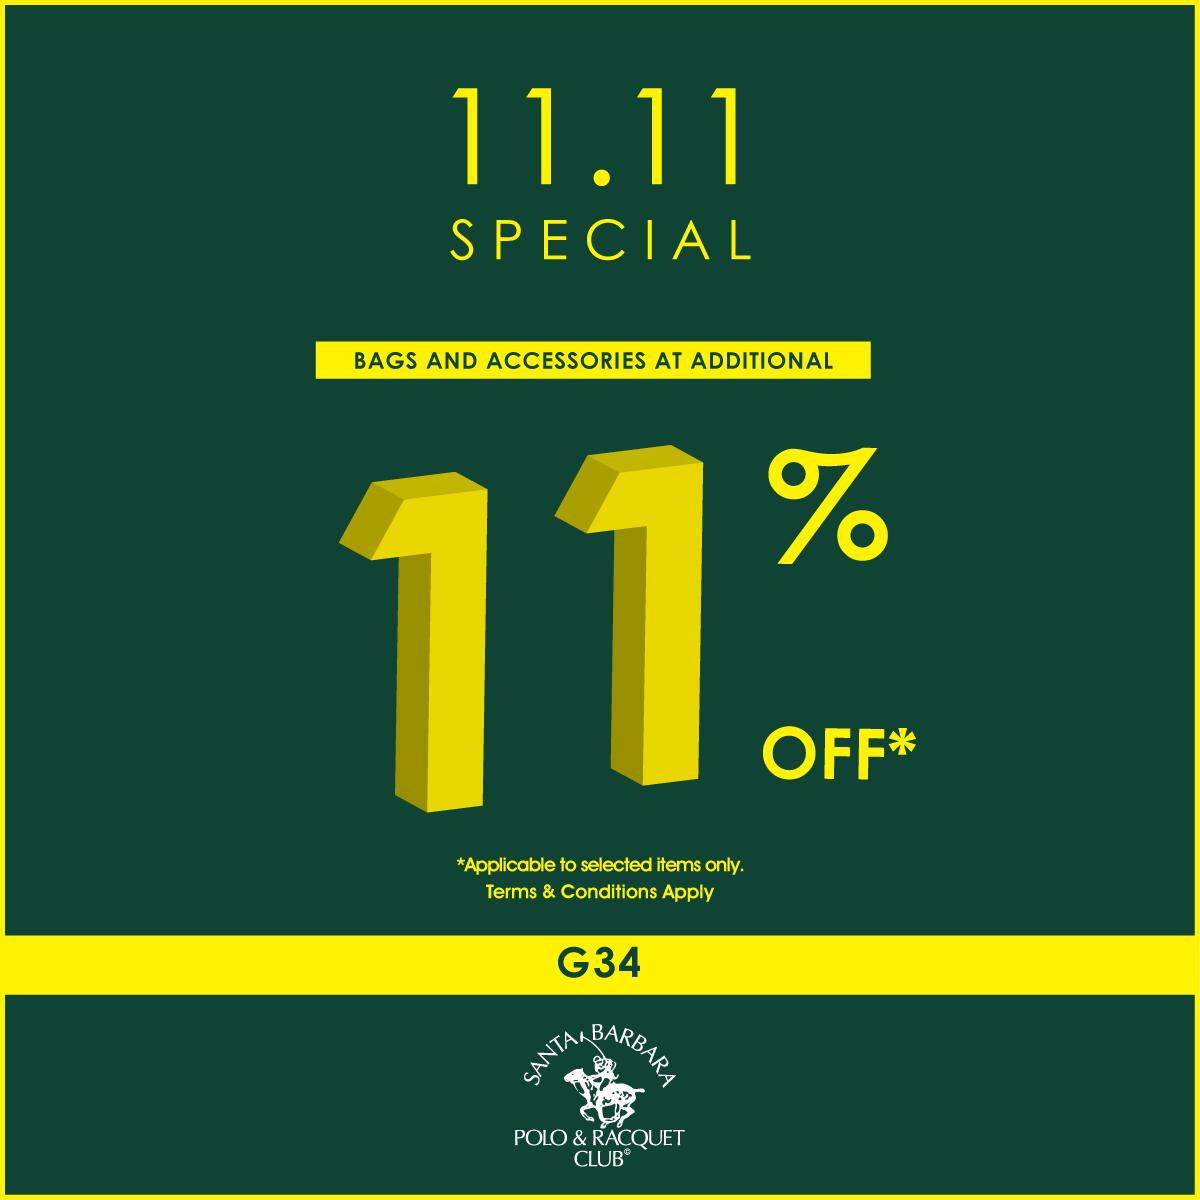 1111Special-Santa-G34